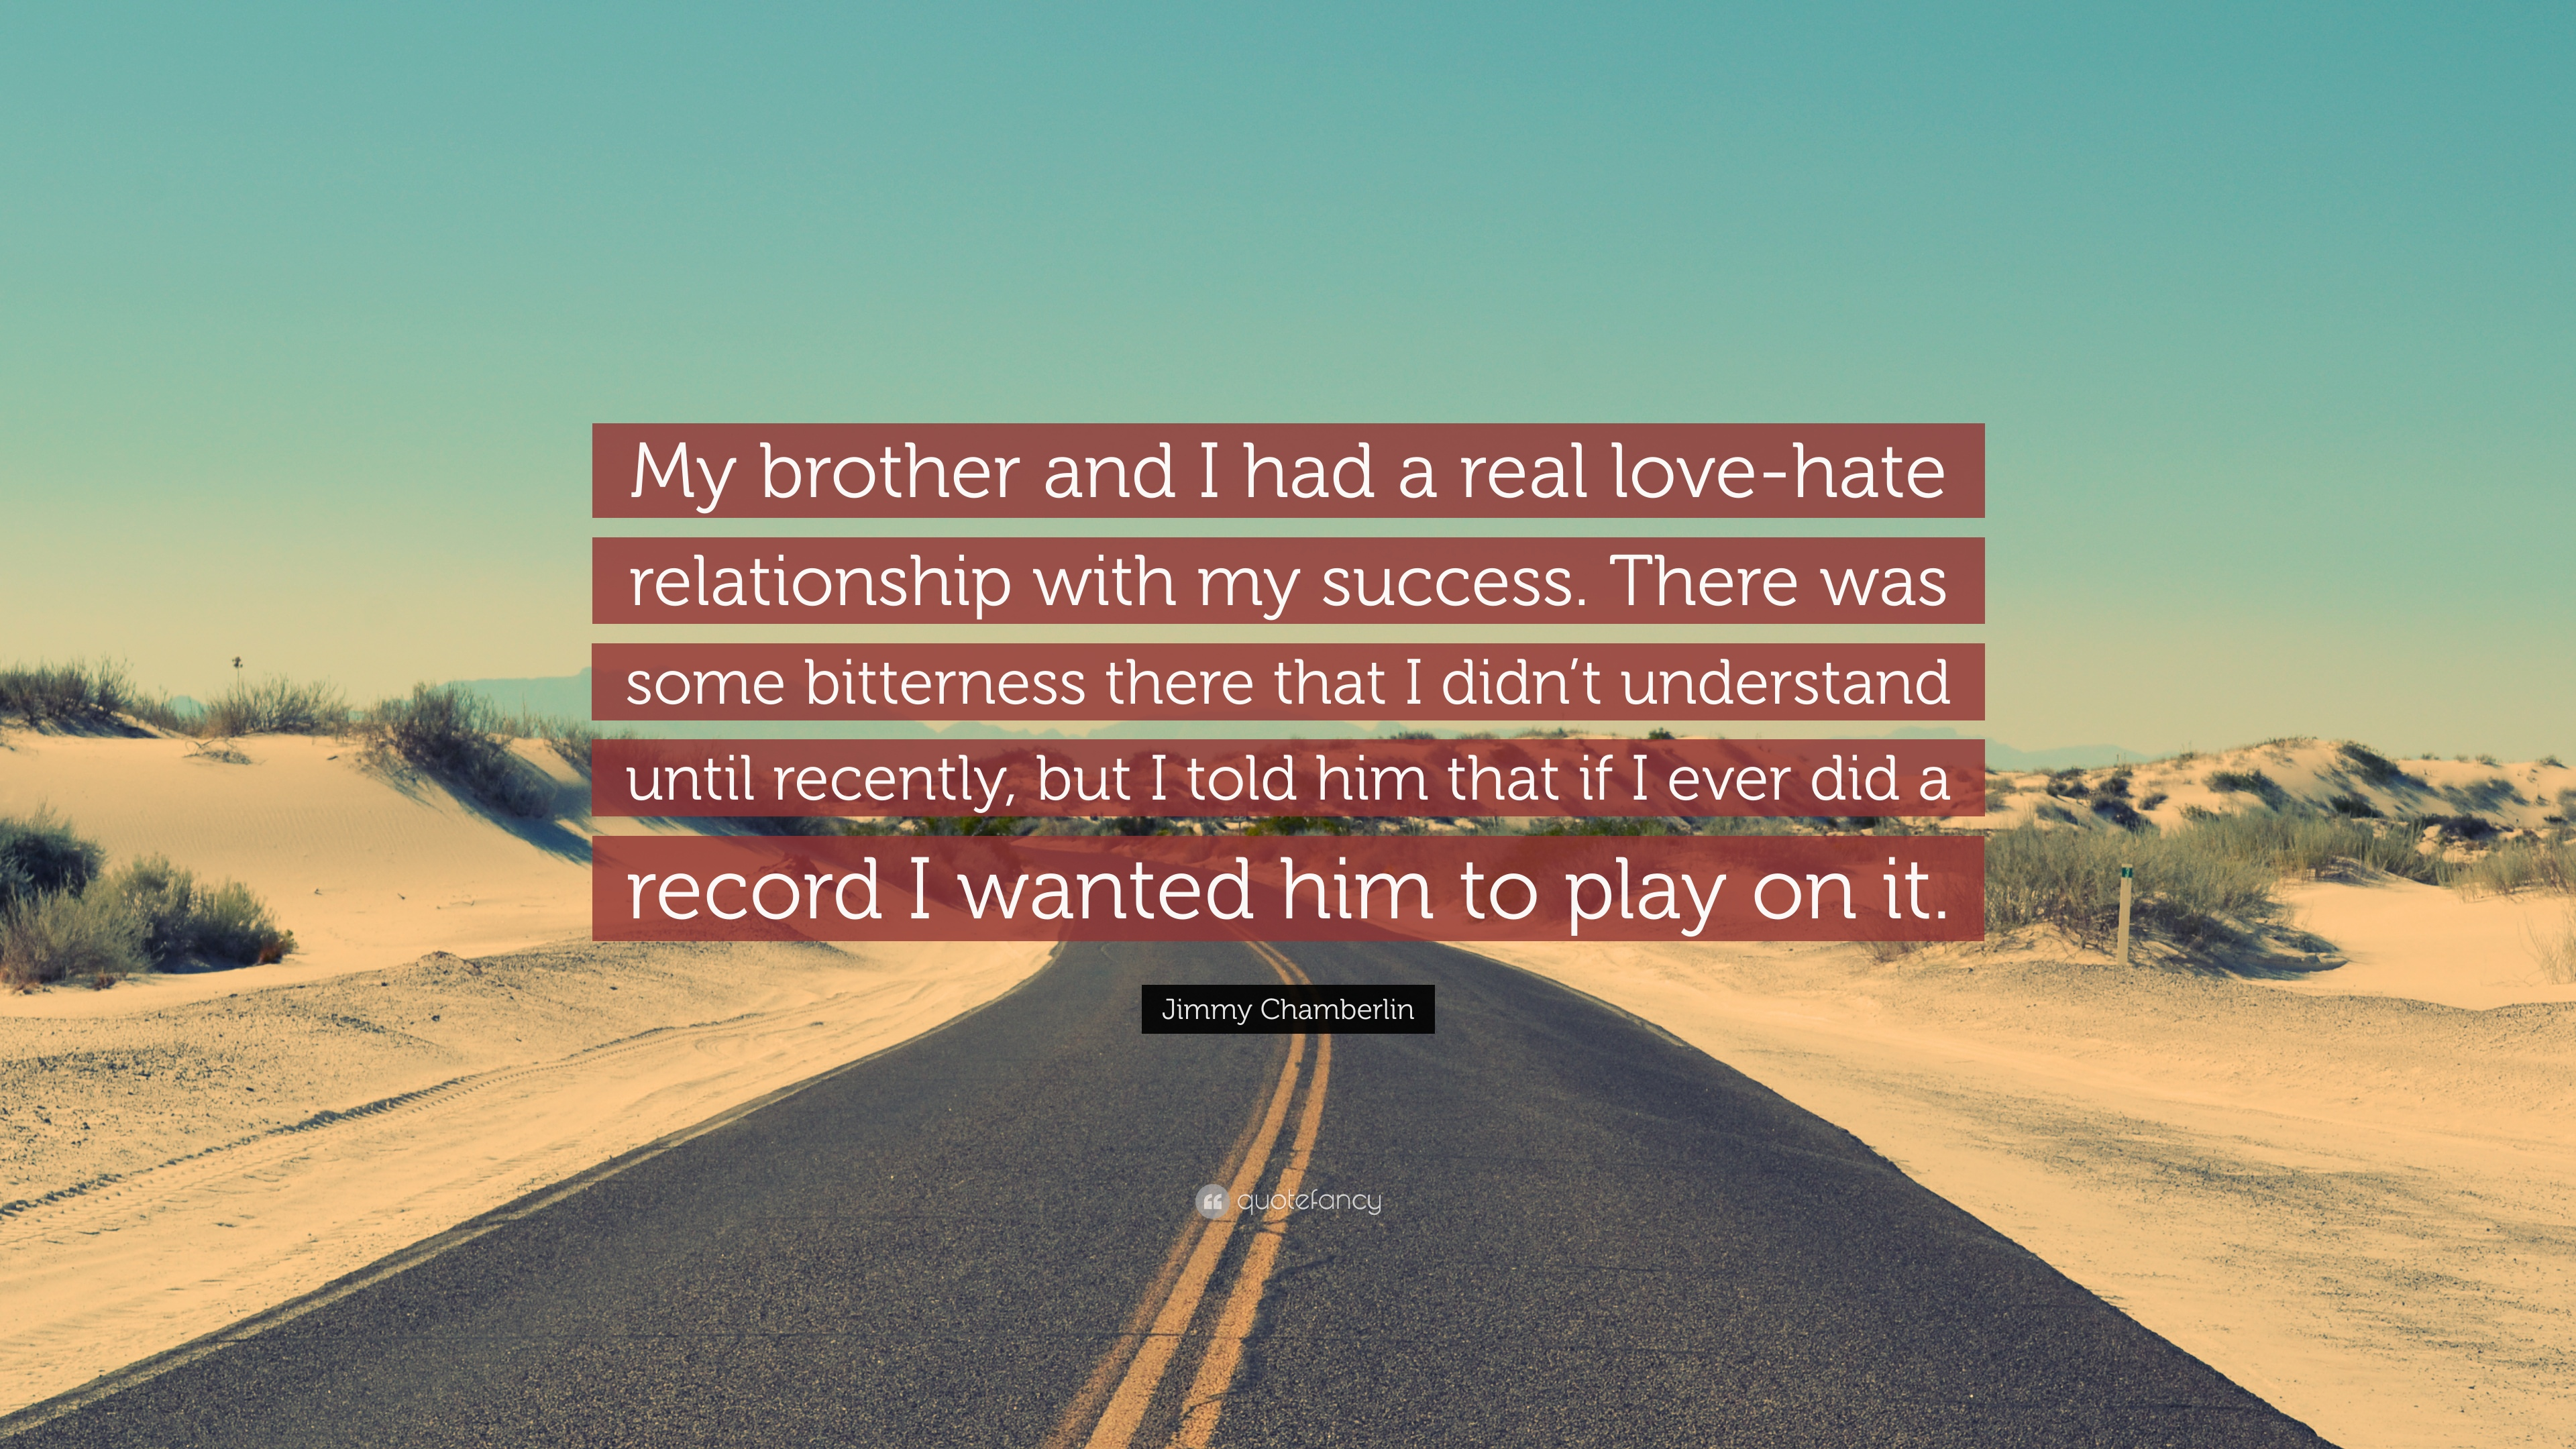 I hate and dislike love my brother 10